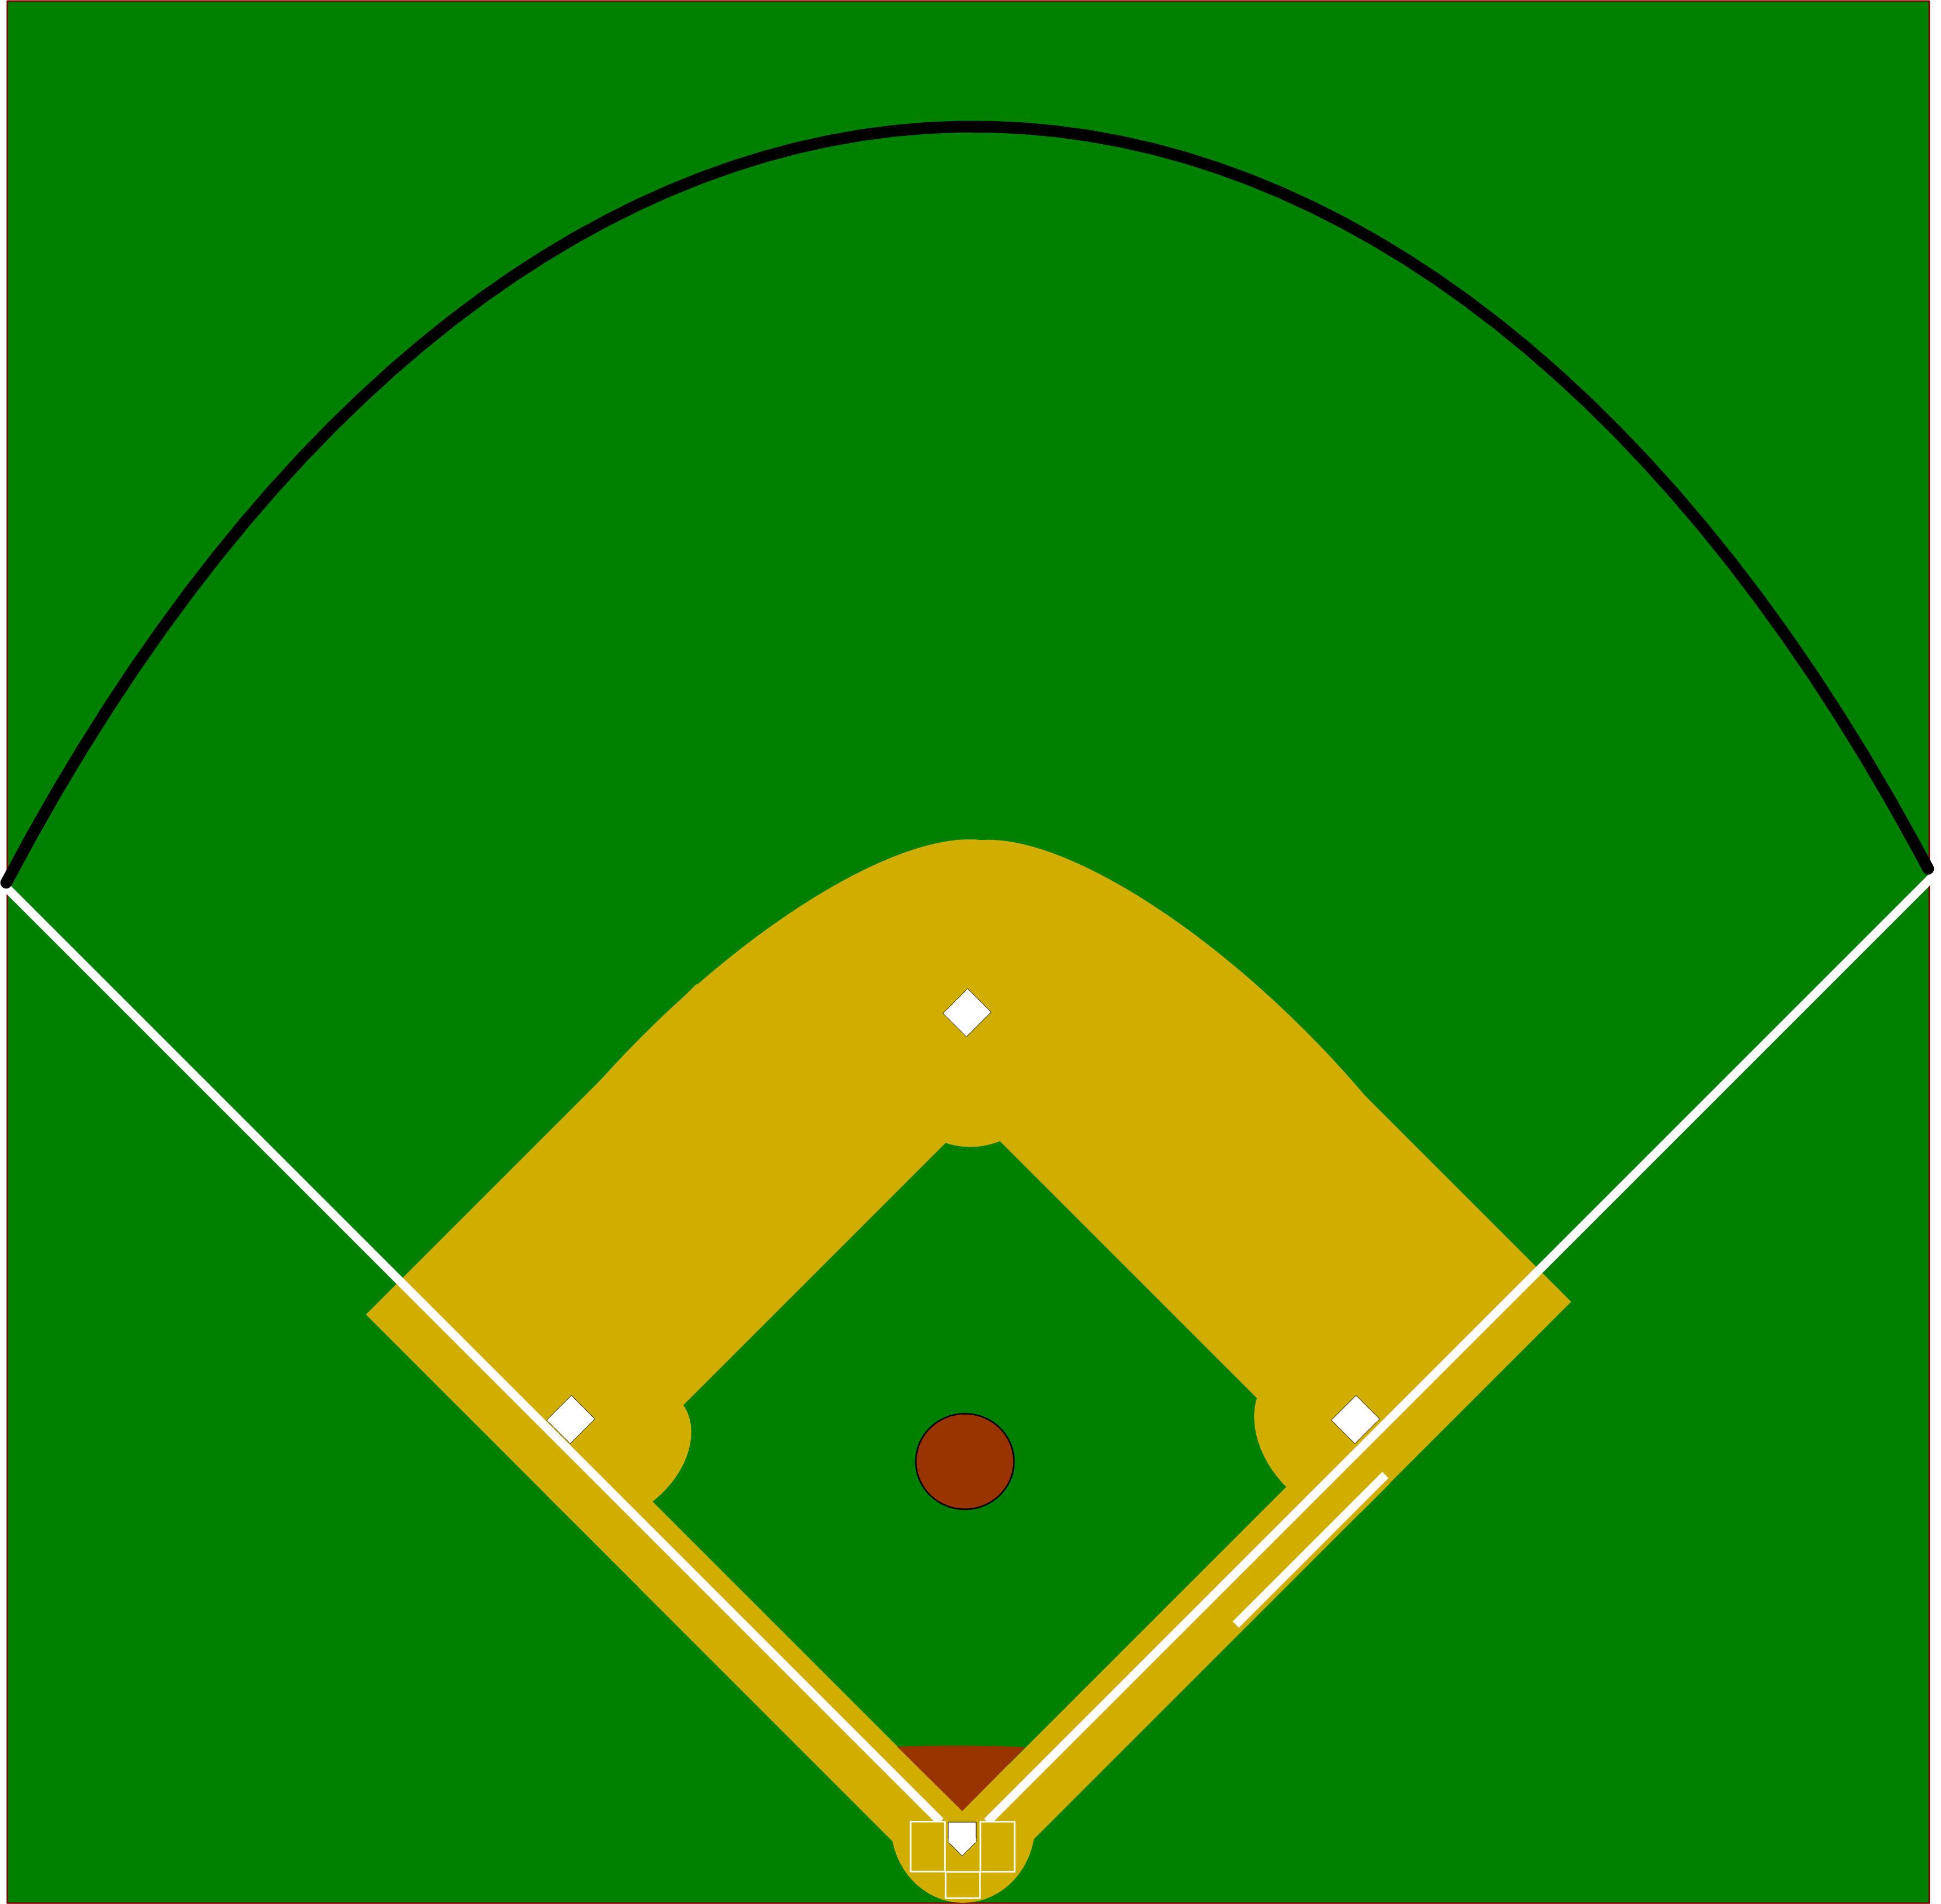 Baseball Field Sketch - ClipArt Best (3526 x 3459 Pixel)